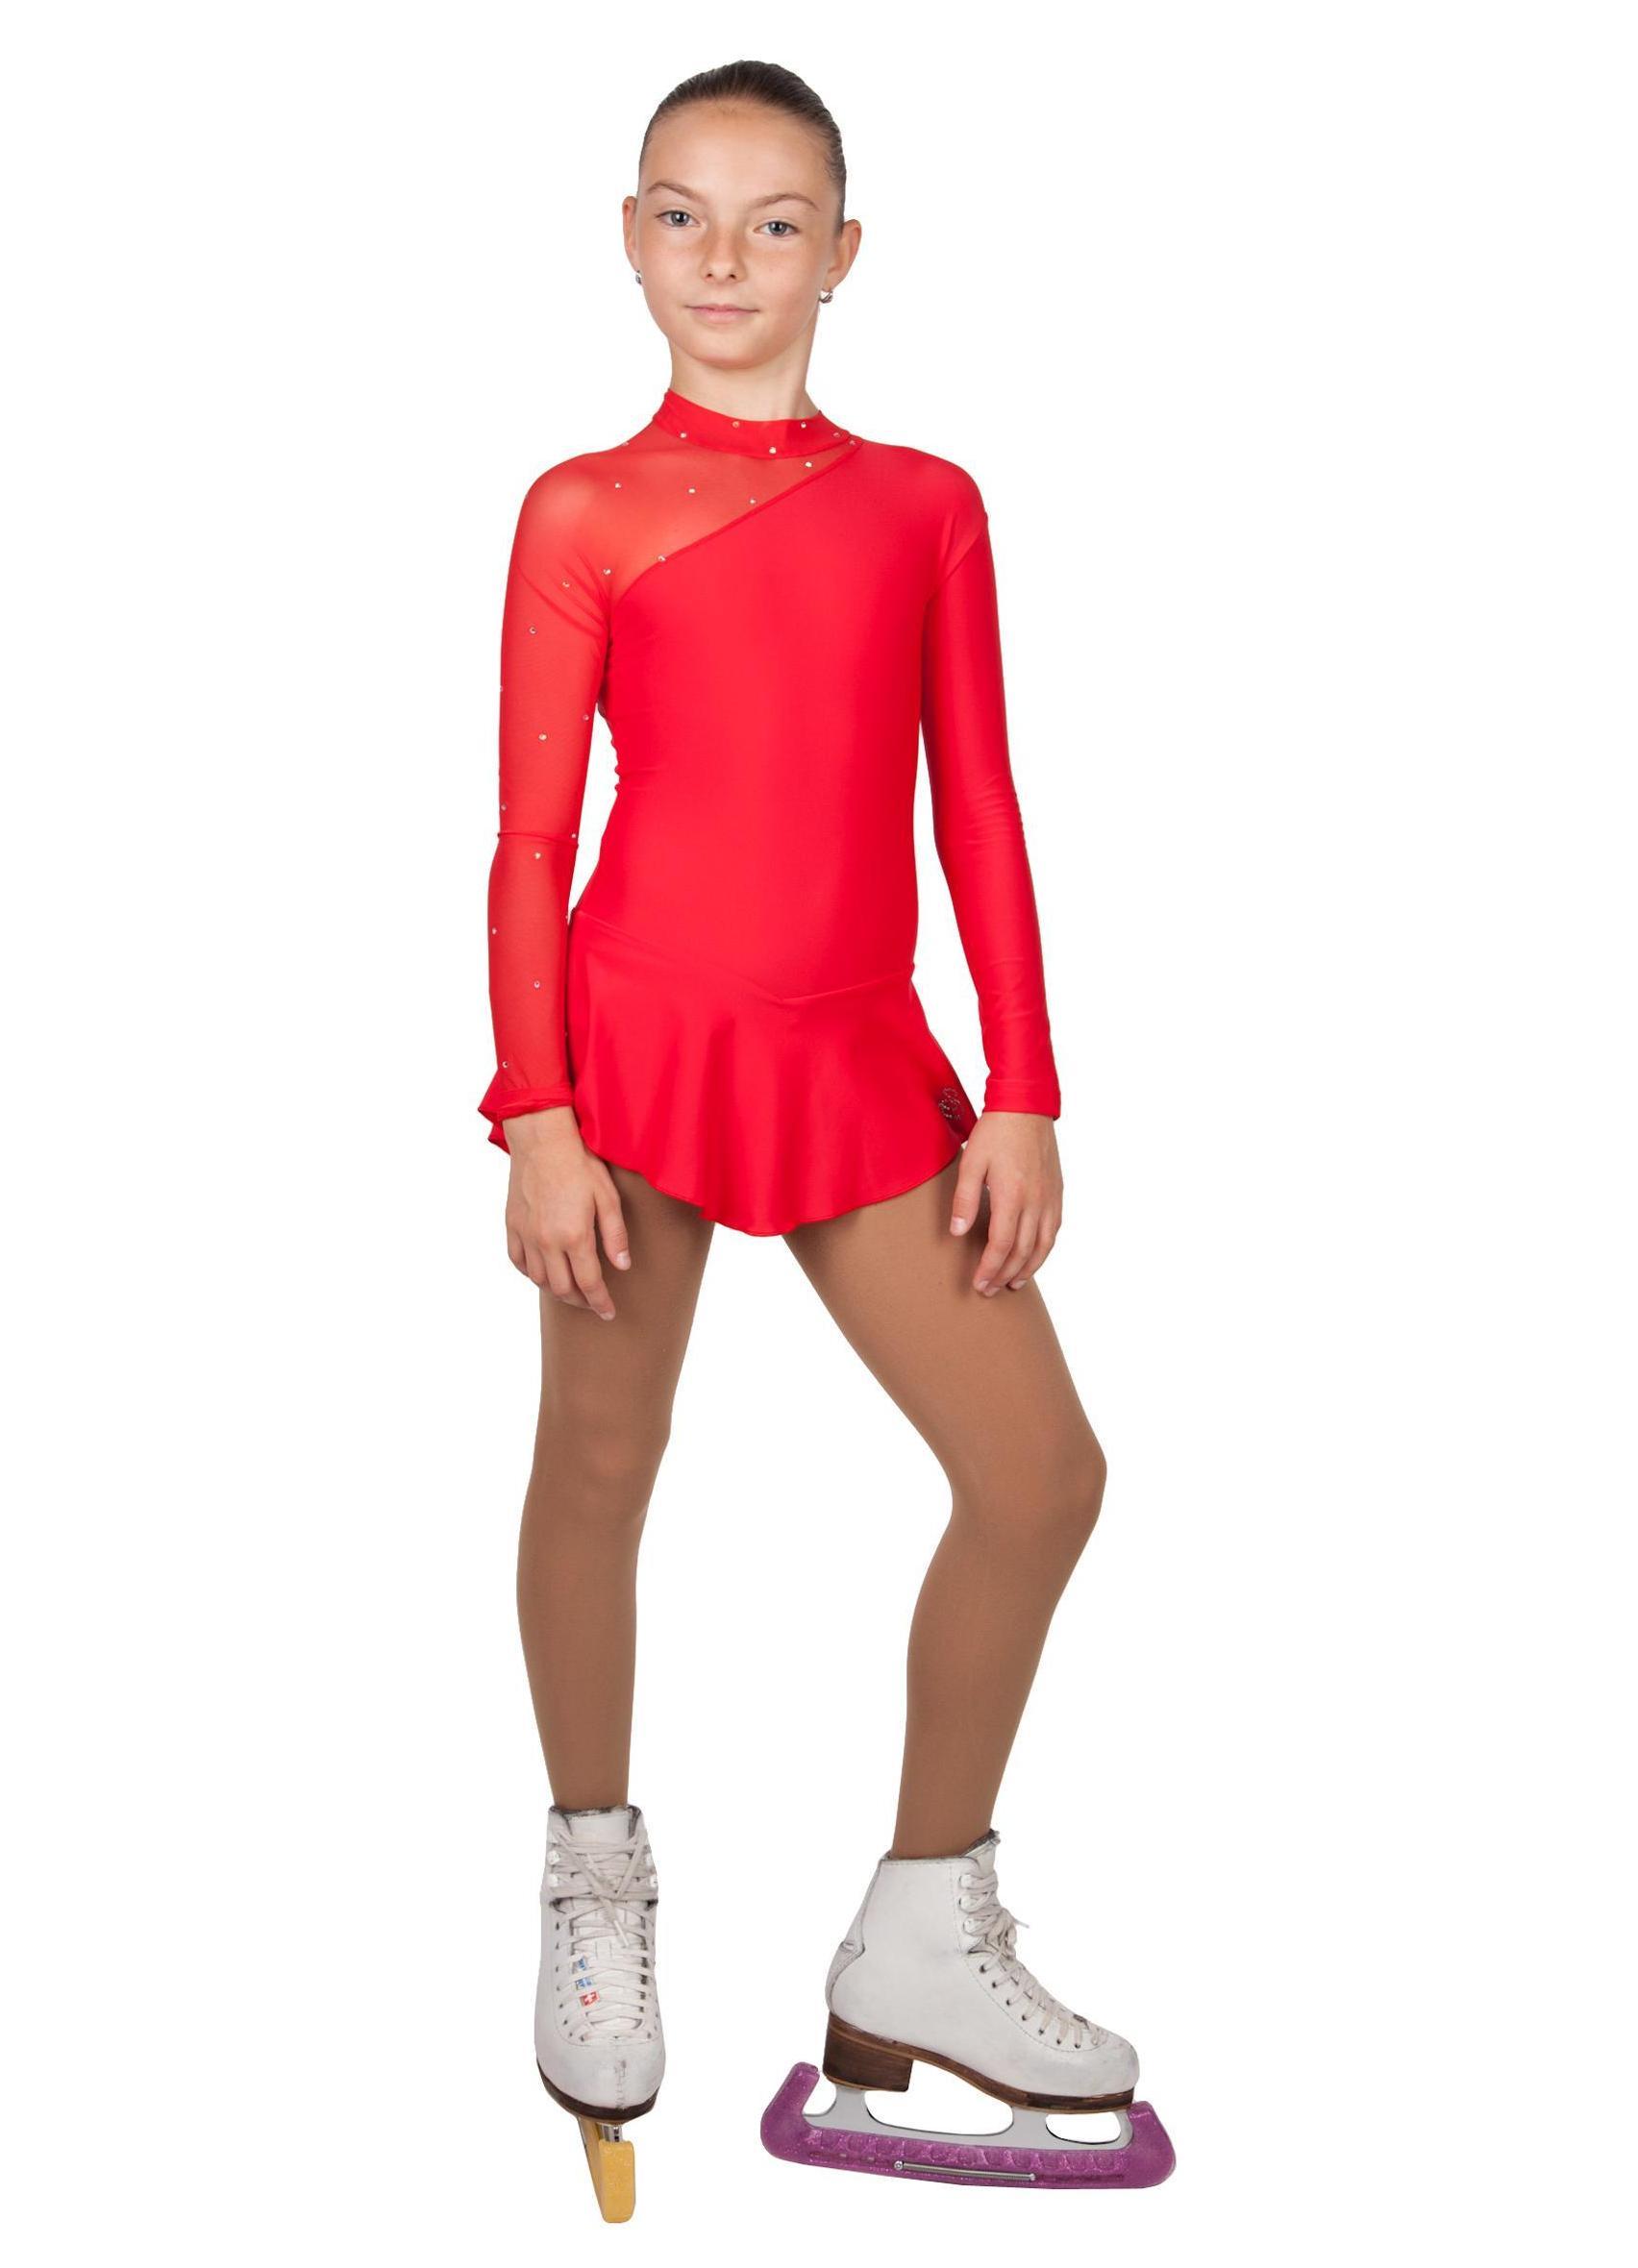 70337fa448ffd4 платья для фигурного катания7, платья для фигурного катания8 ...